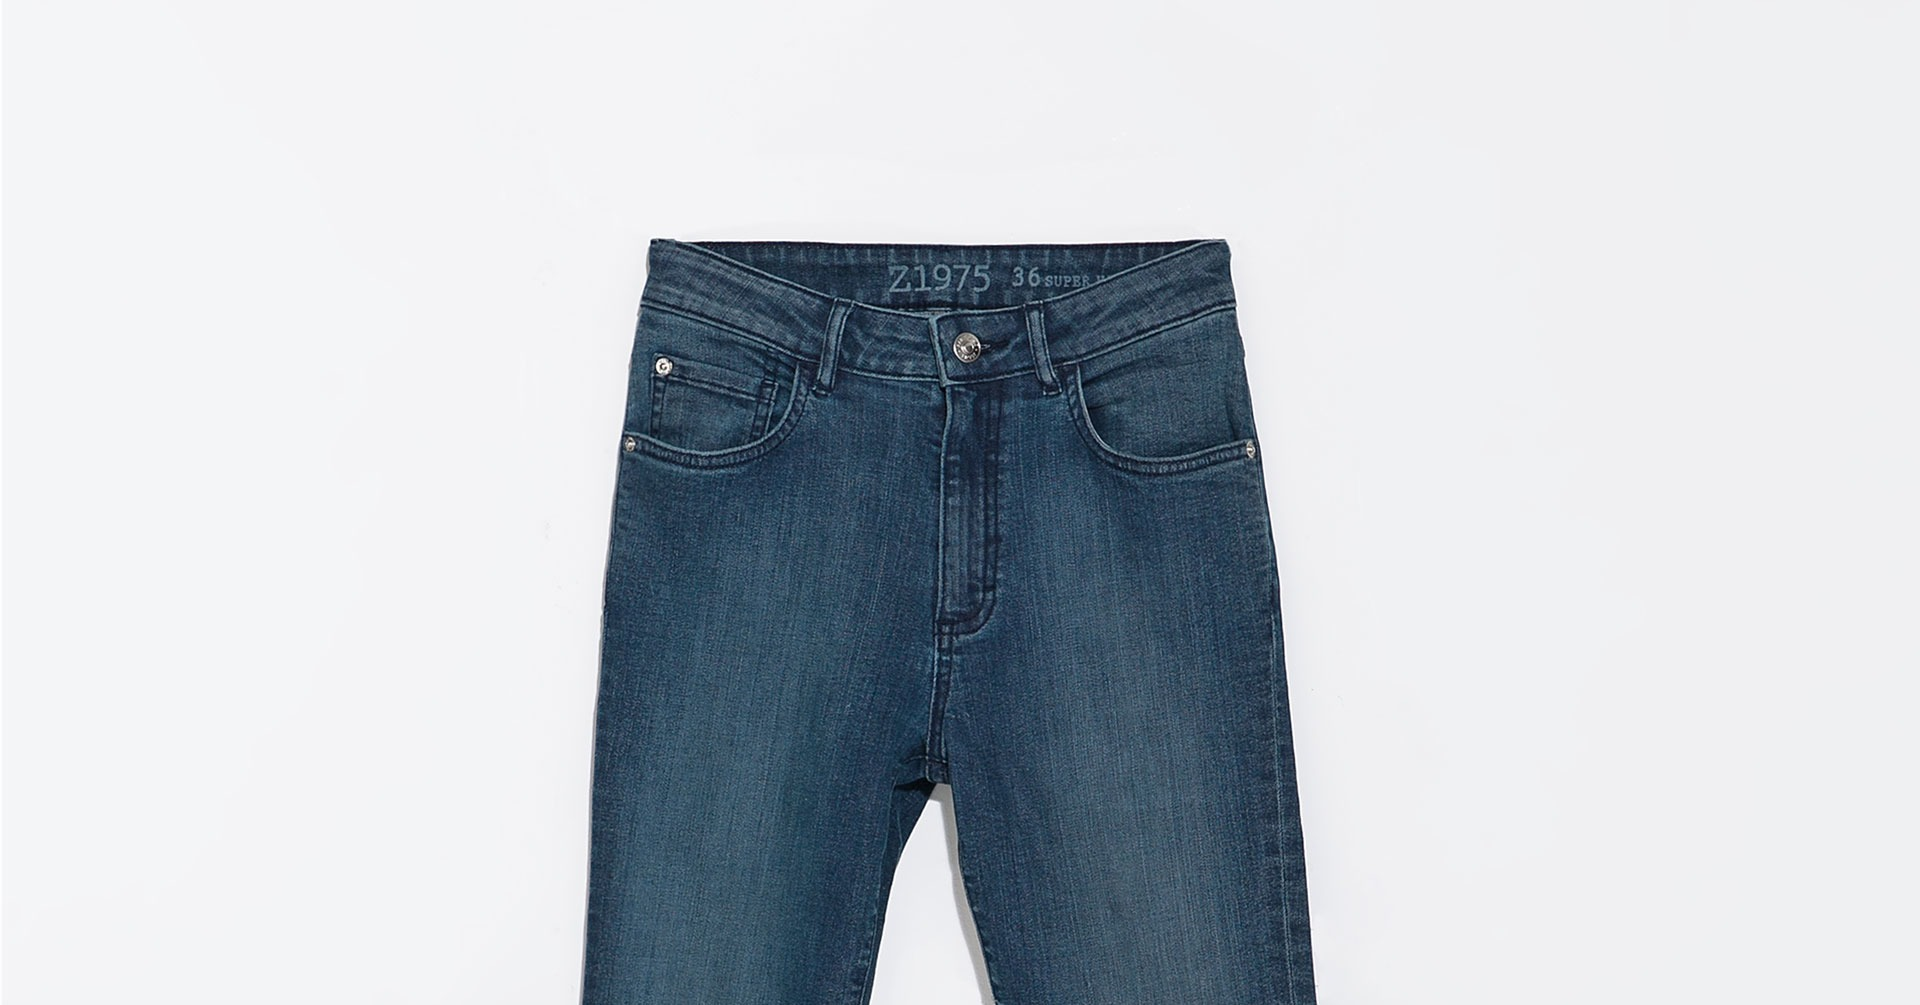 high waisted jeans - photo #18